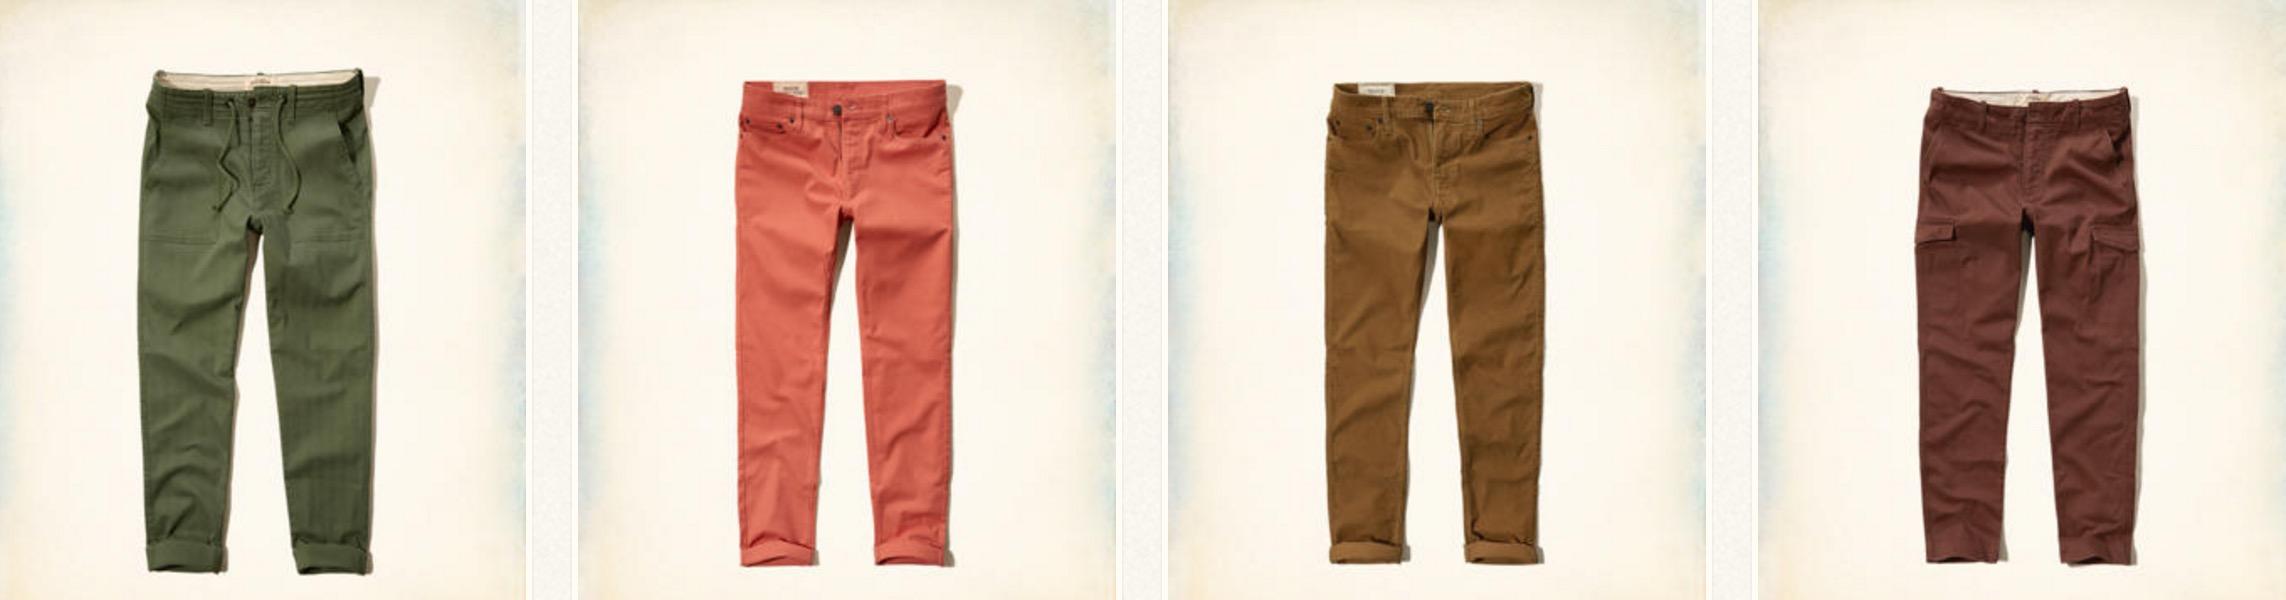 hollister-long-pants